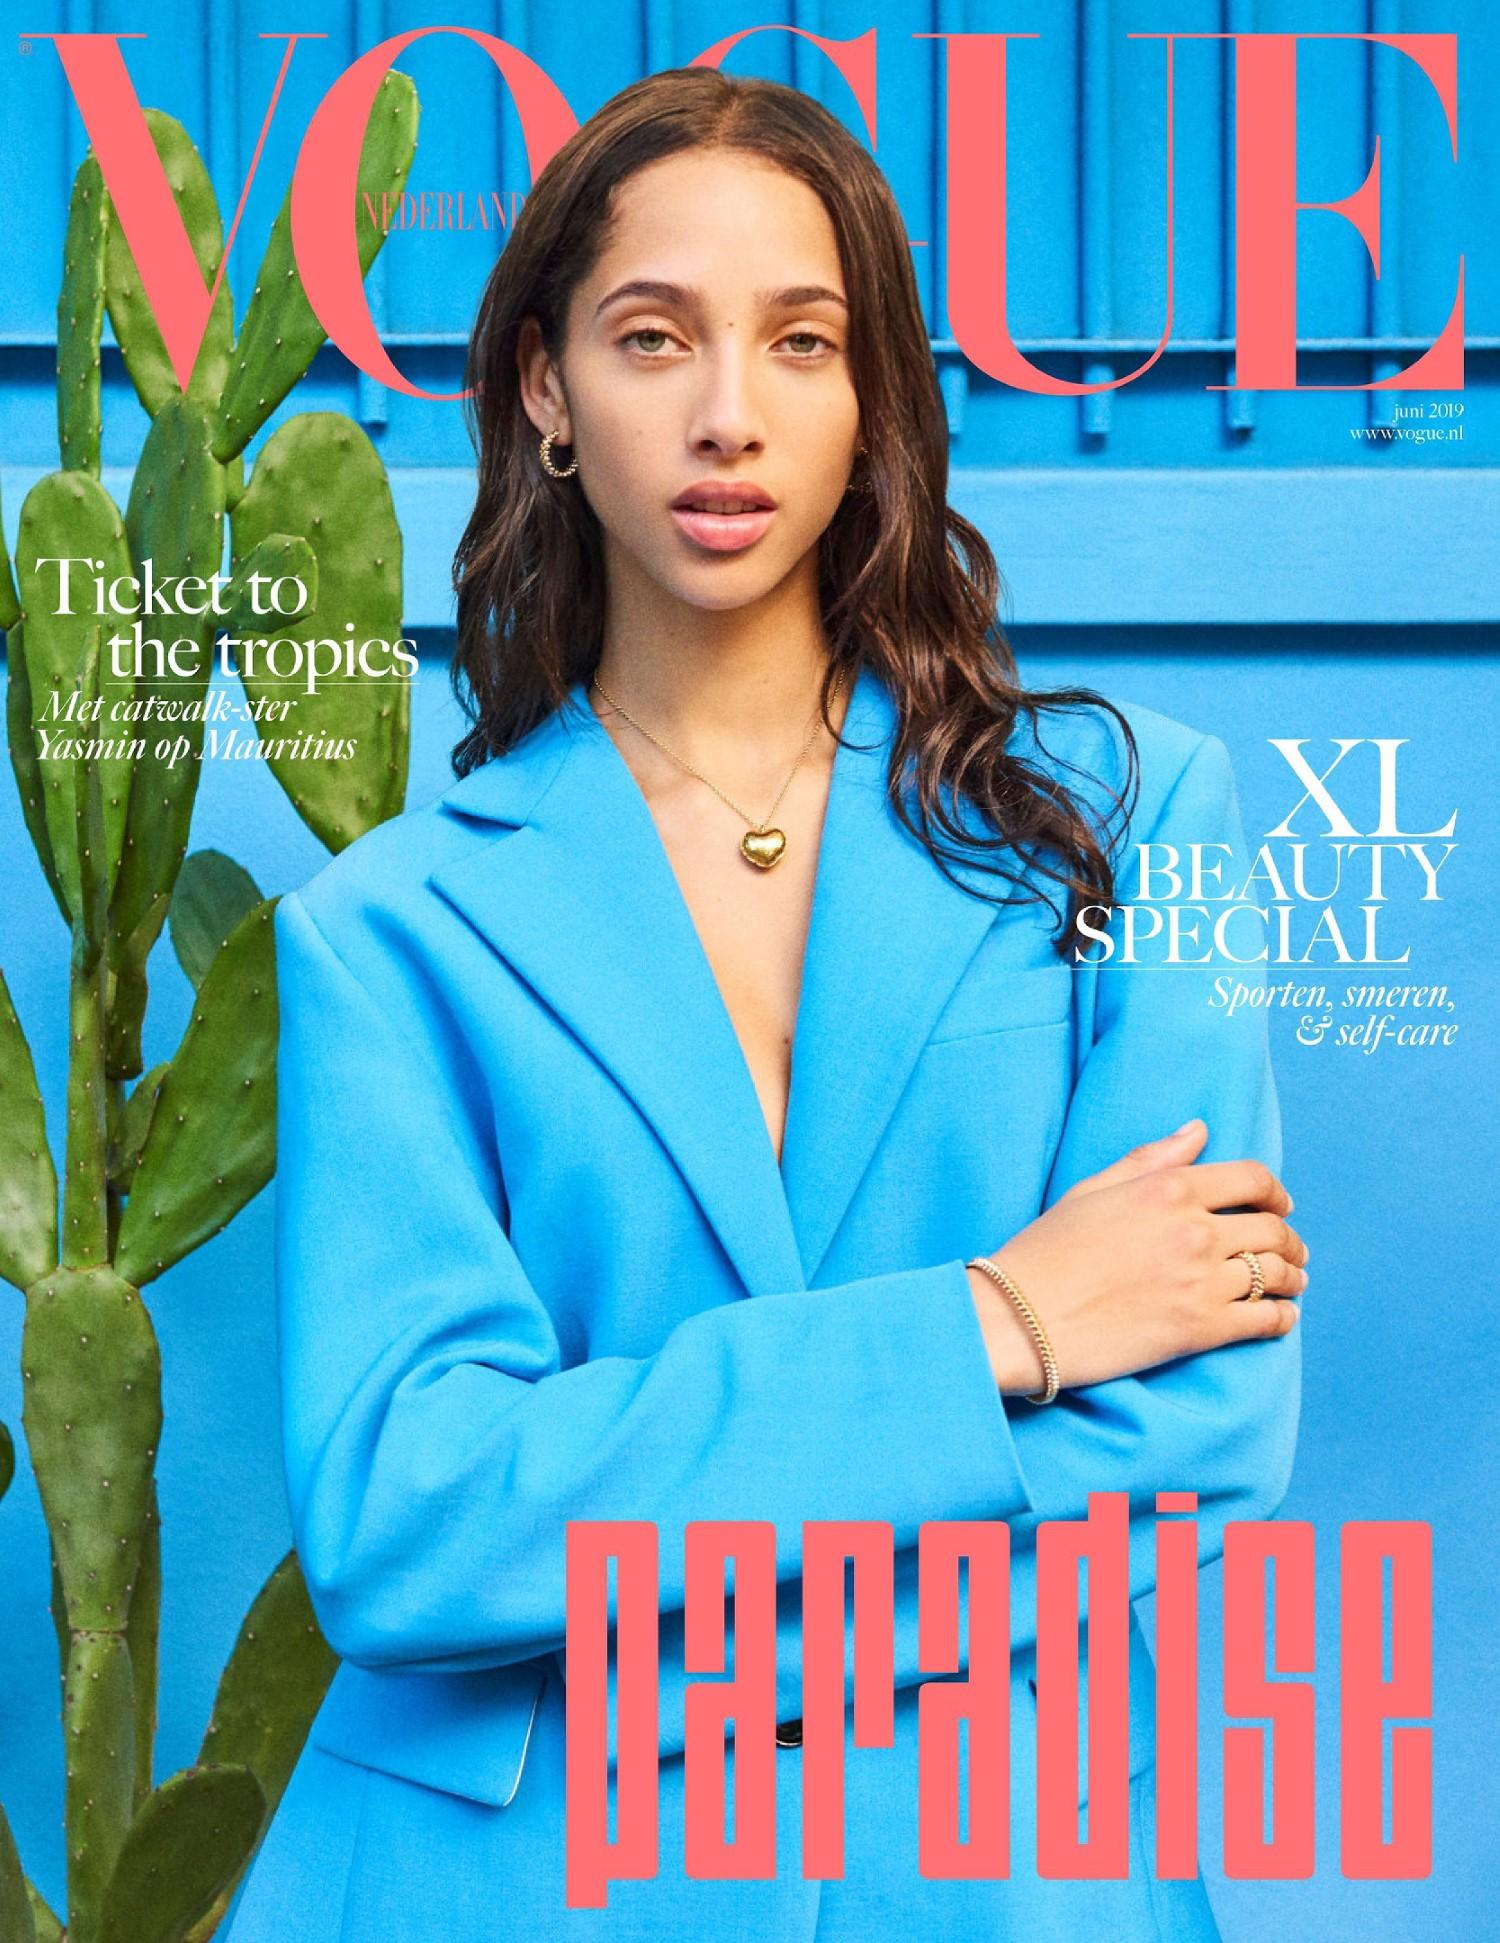 Yasmin Wijnaldum Tung Walsh Vogue Netherlands June 2019 (11).jpg